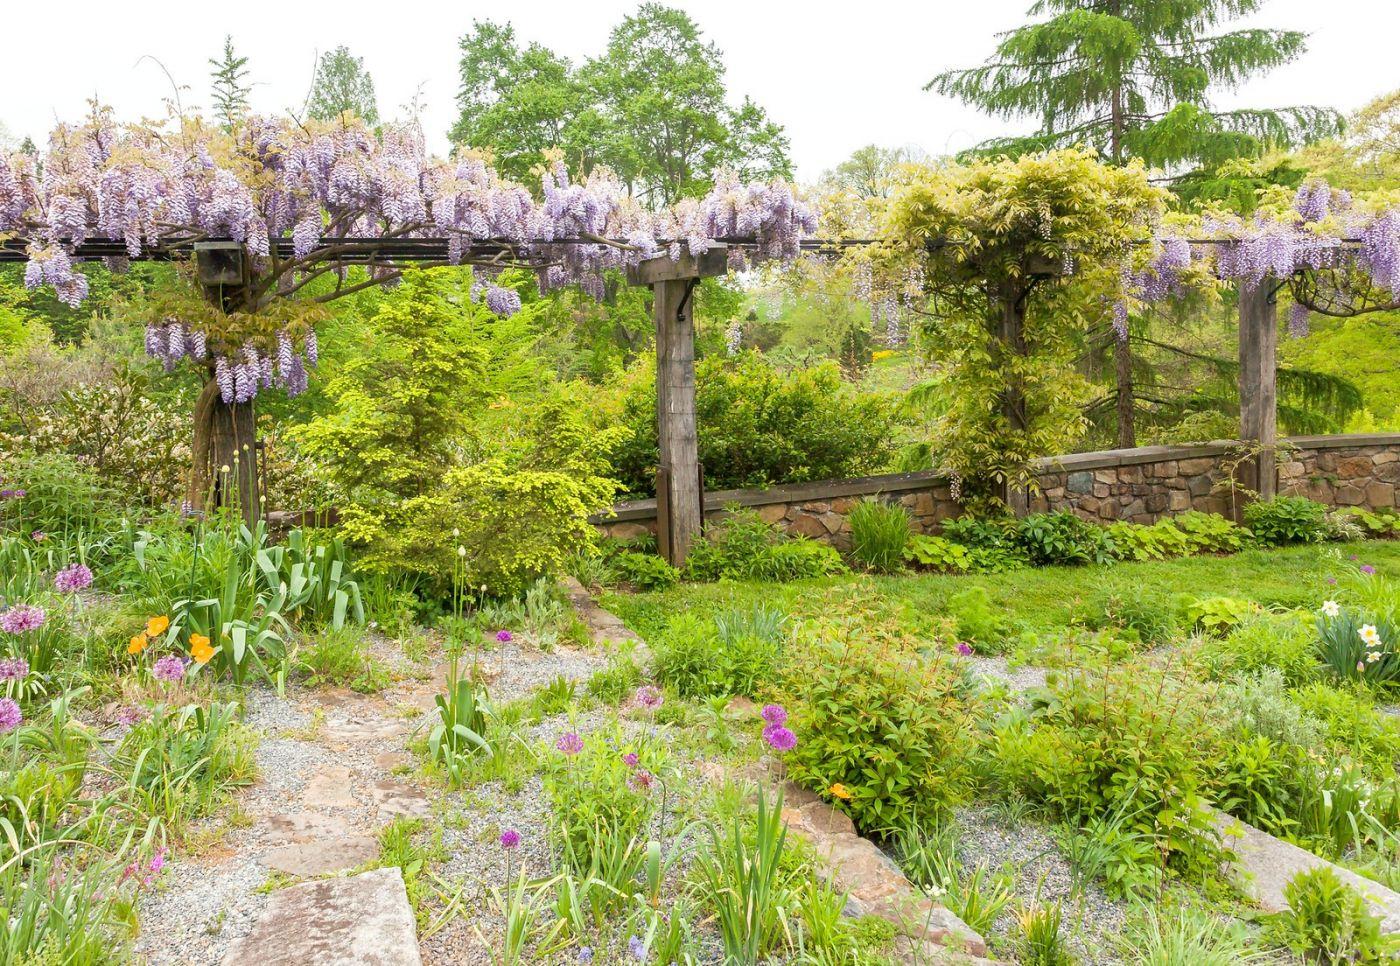 Chanticleer花园,那年盛开的紫藤花_图1-40